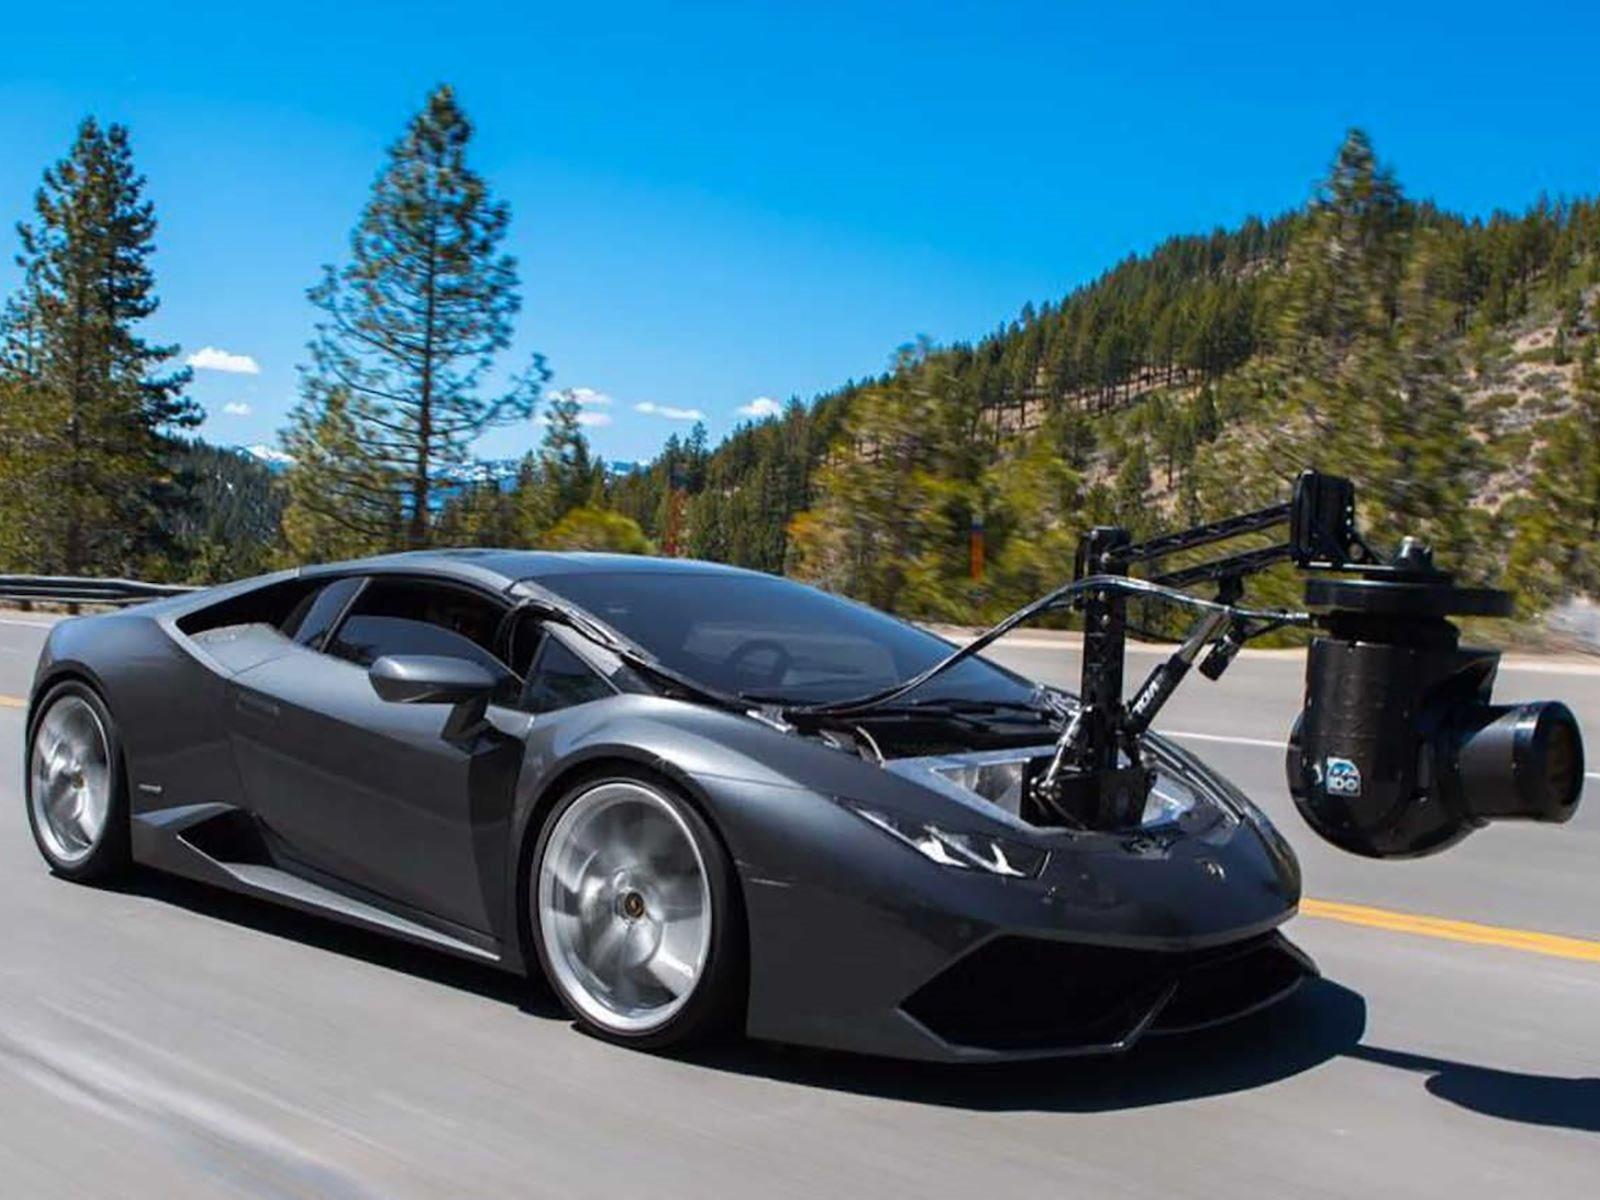 De Snelste Camera Auto Ter Wereld De Lamborghini Huracan